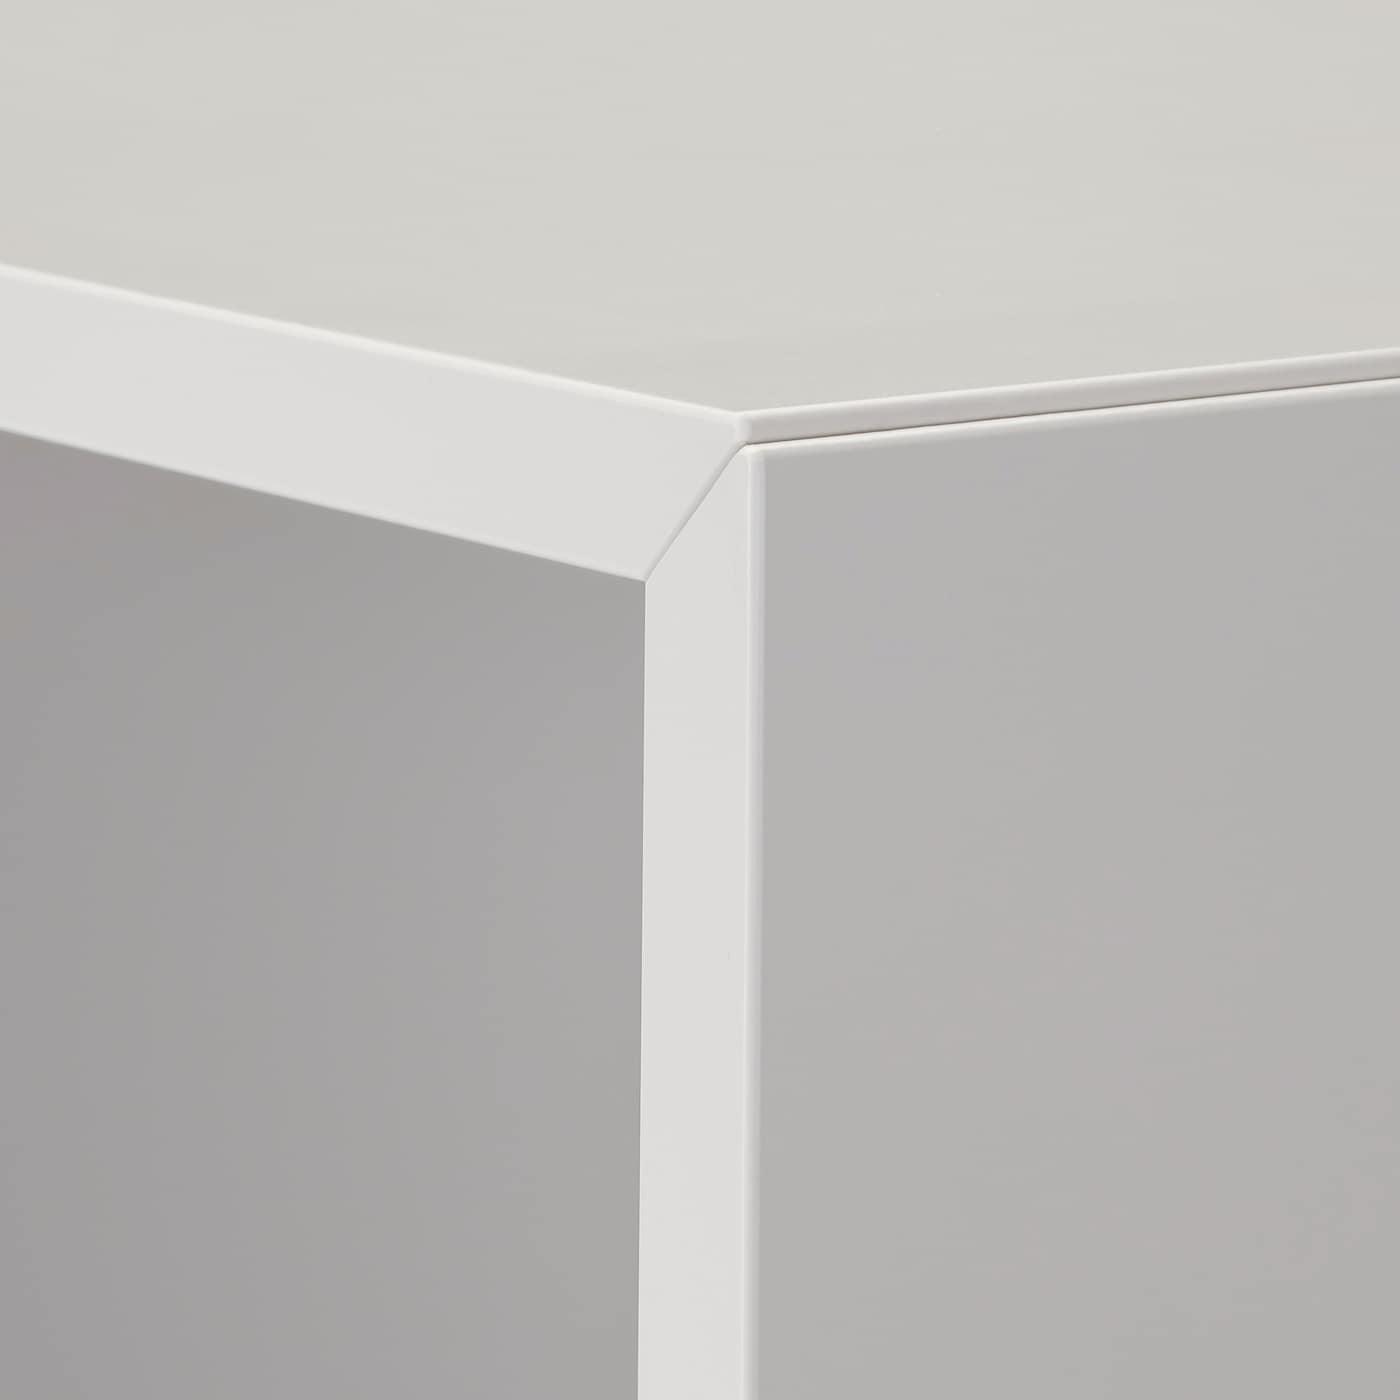 EKET Wall-mounted shelving unit w 4 comp, light grey, 70x35x70 cm